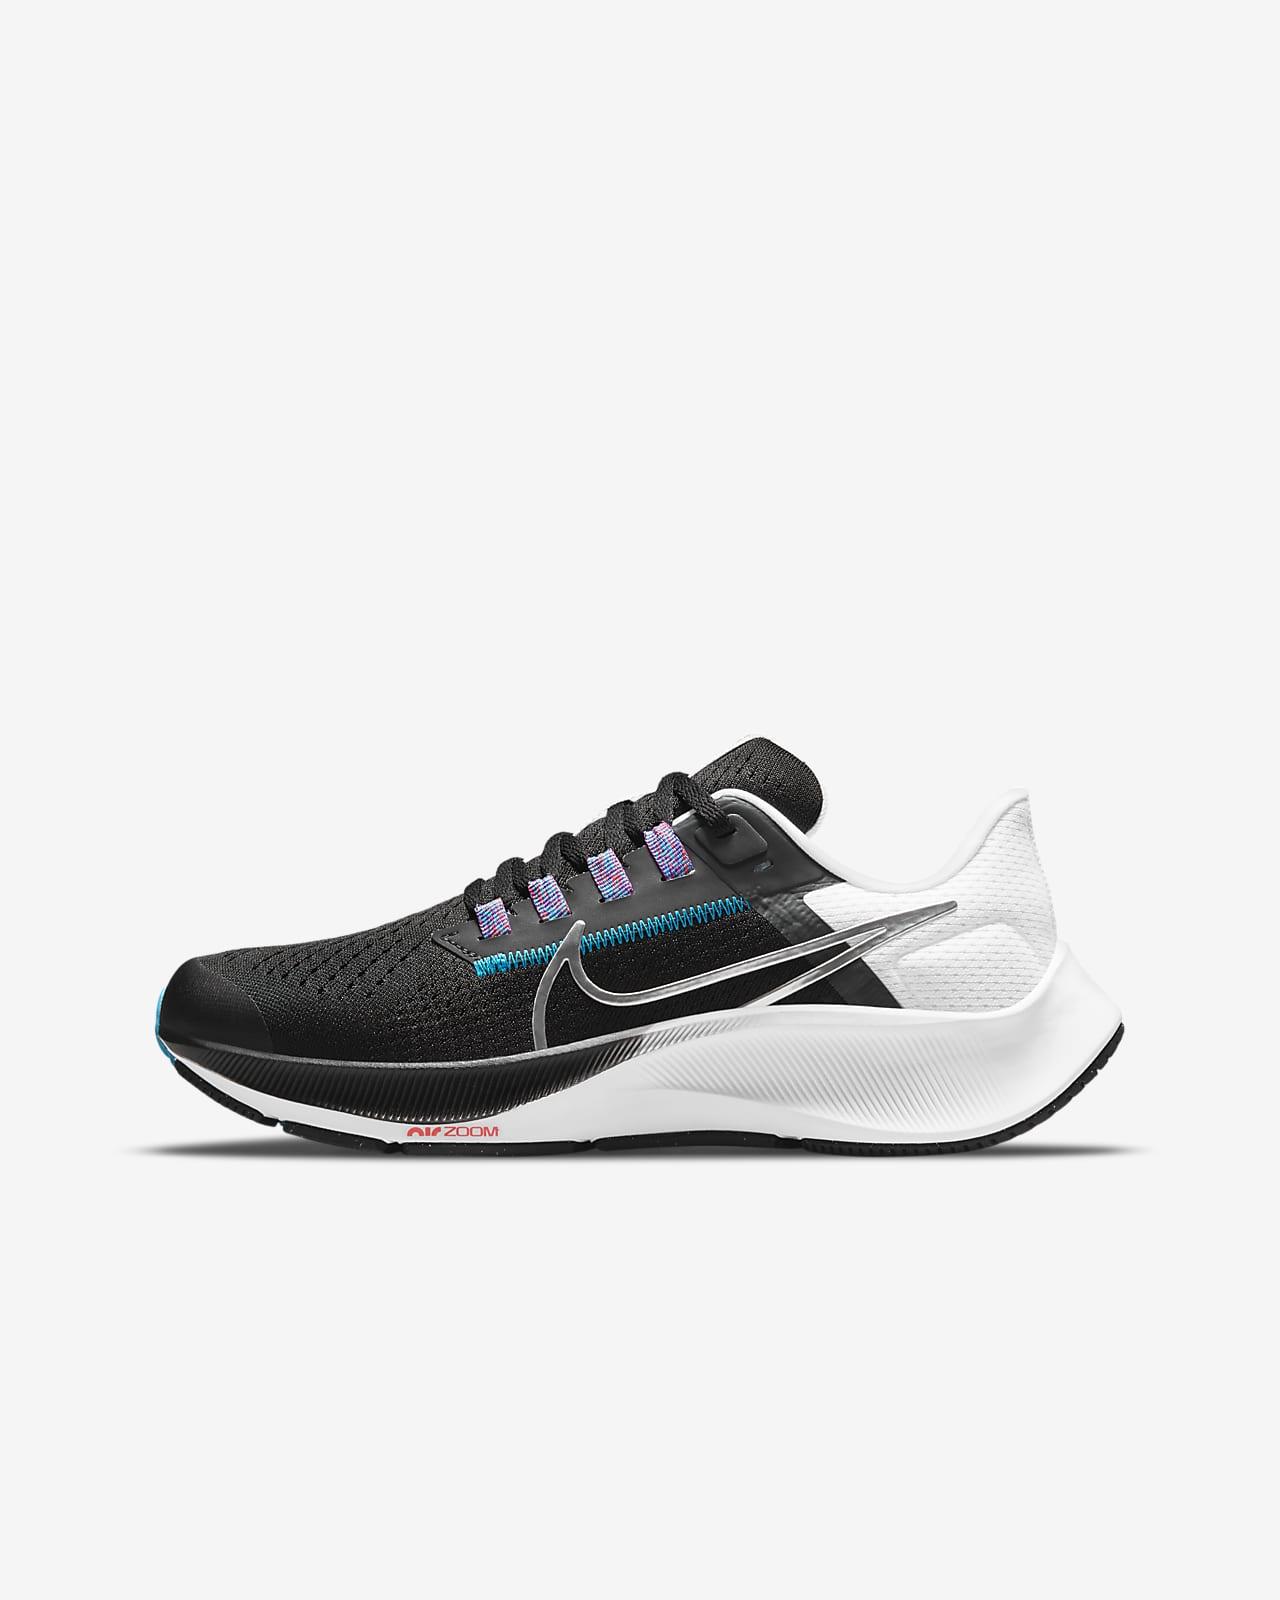 Calzado de running para niños talla pequeña/grande Nike Air Zoom Pegasus 38